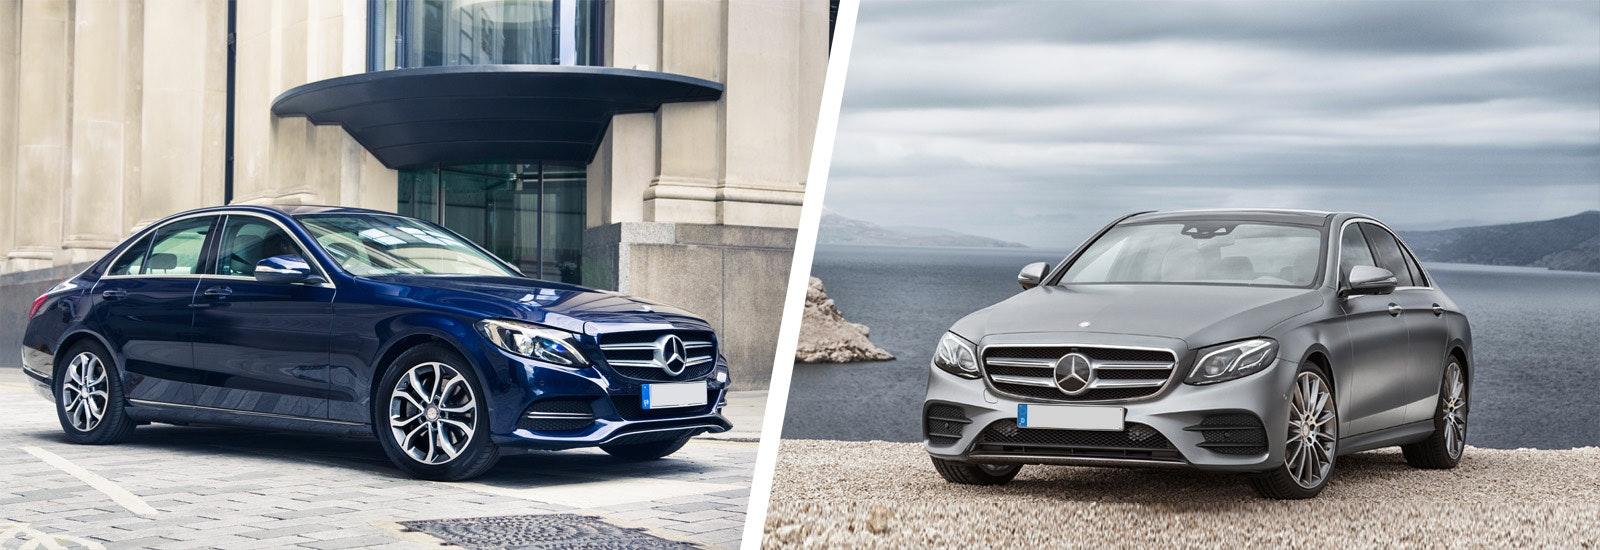 Mercedes C Class Vs Mercedes E Class Comparison Carwow